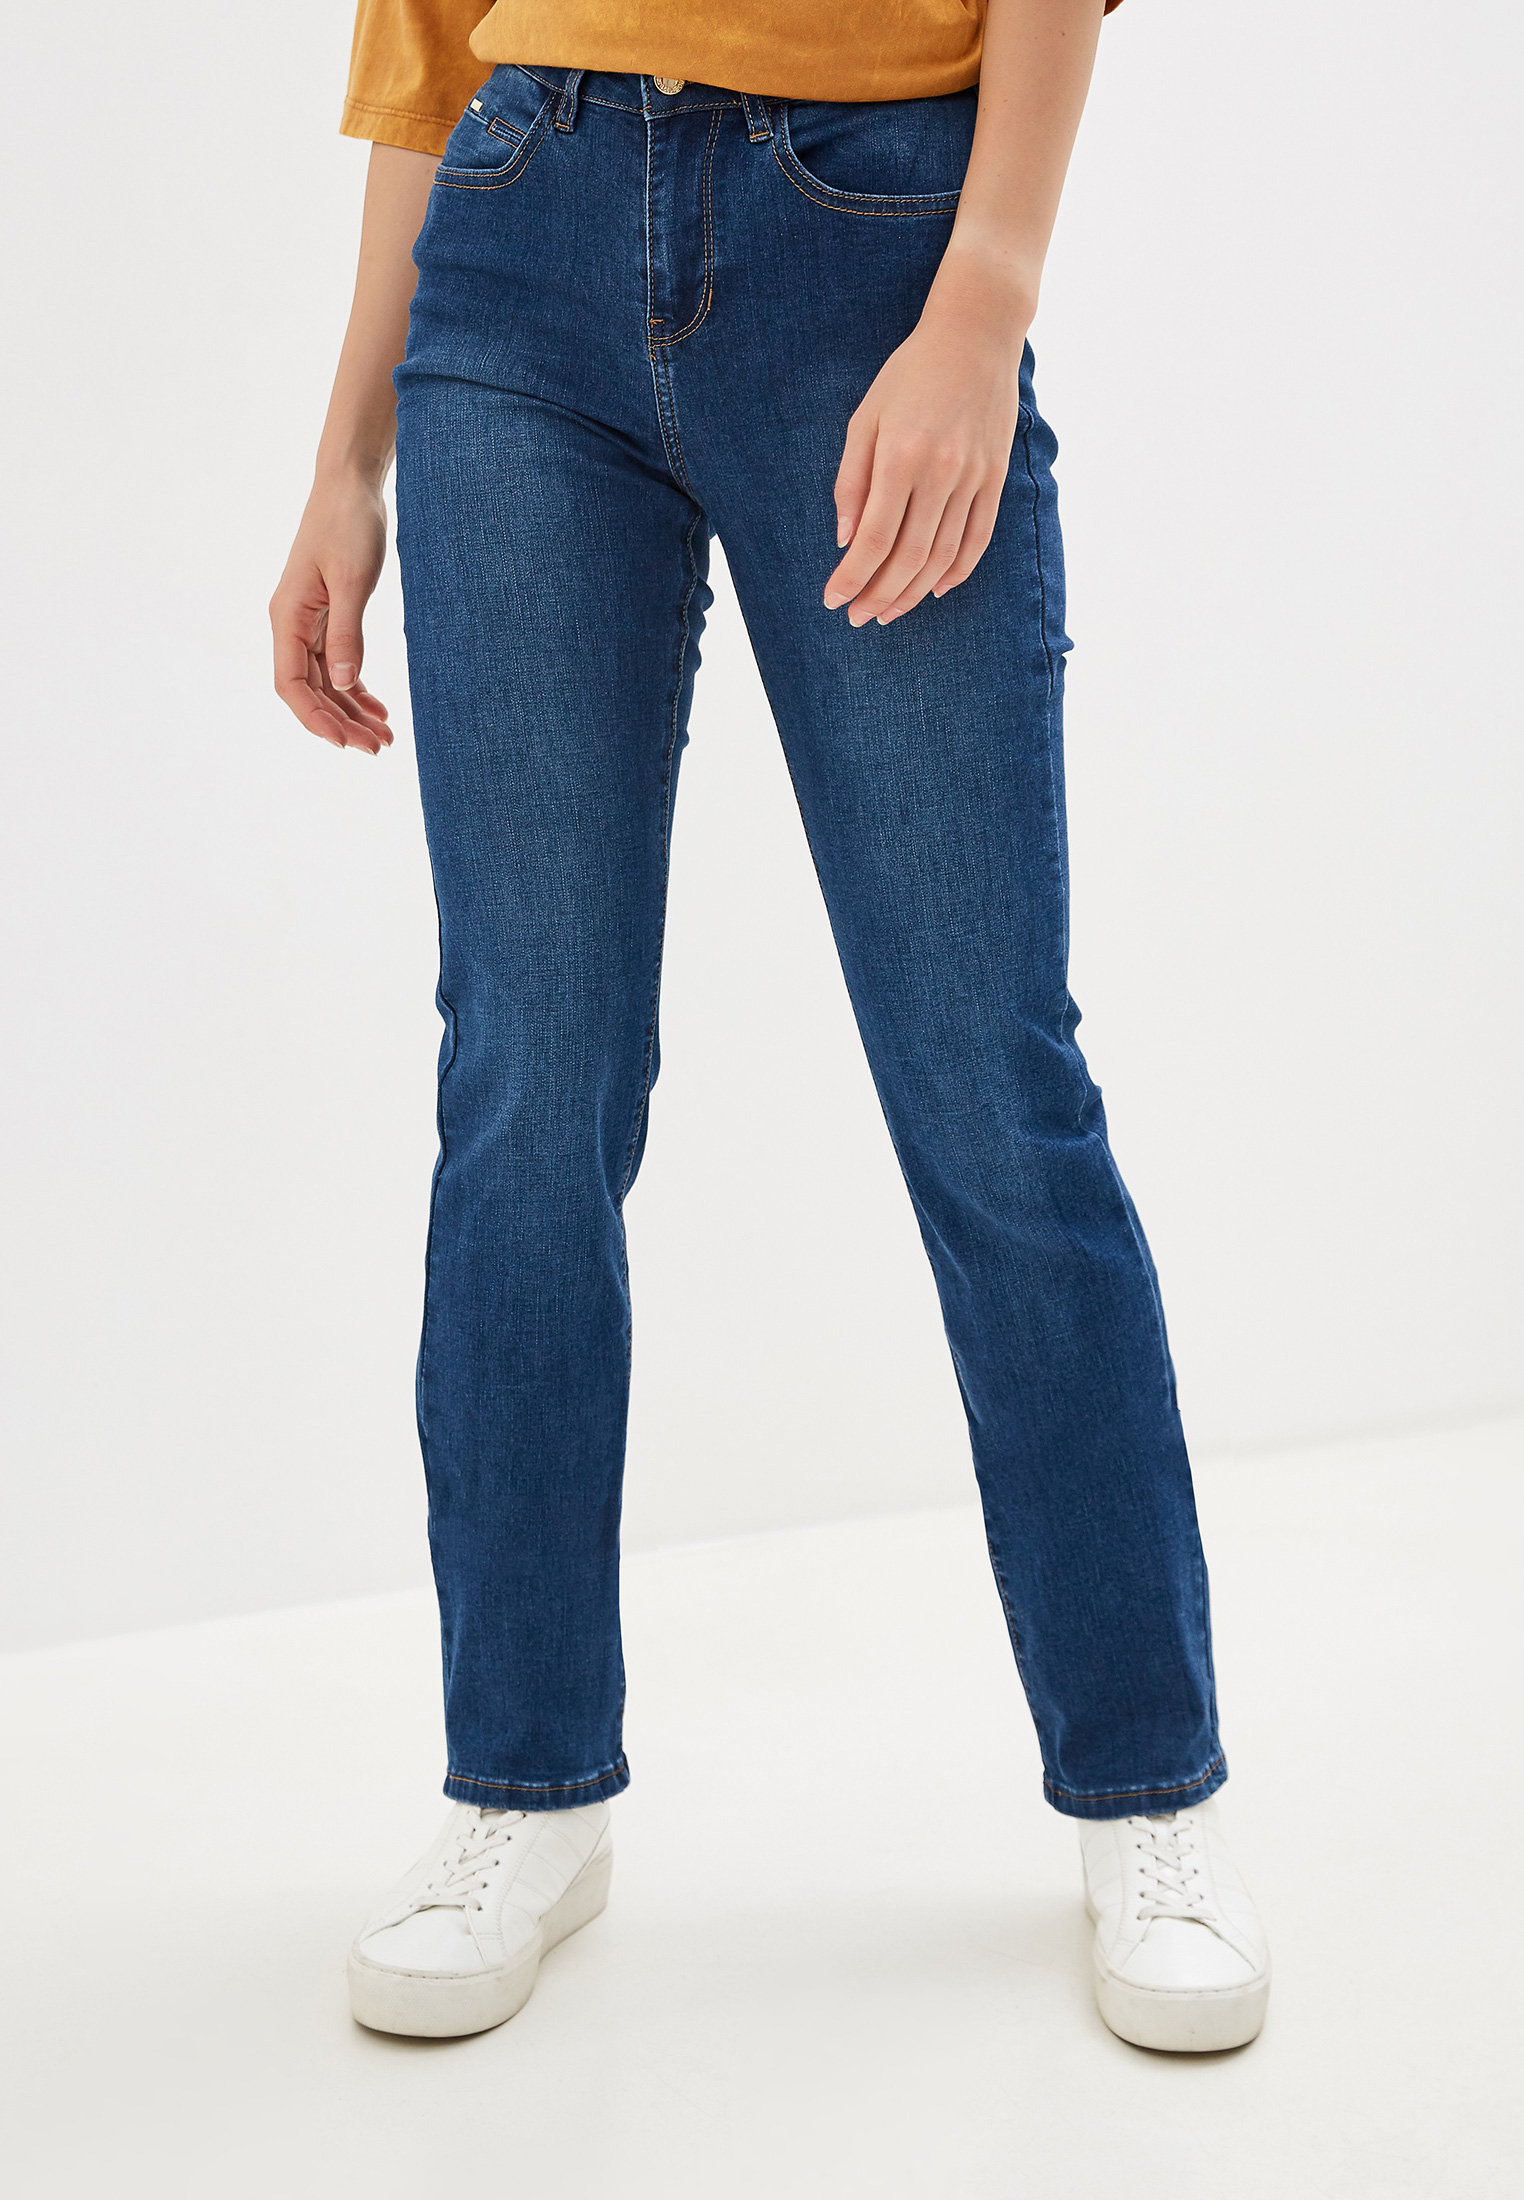 Зауженные джинсы Sela (Сэла) PJ-135/689-9391